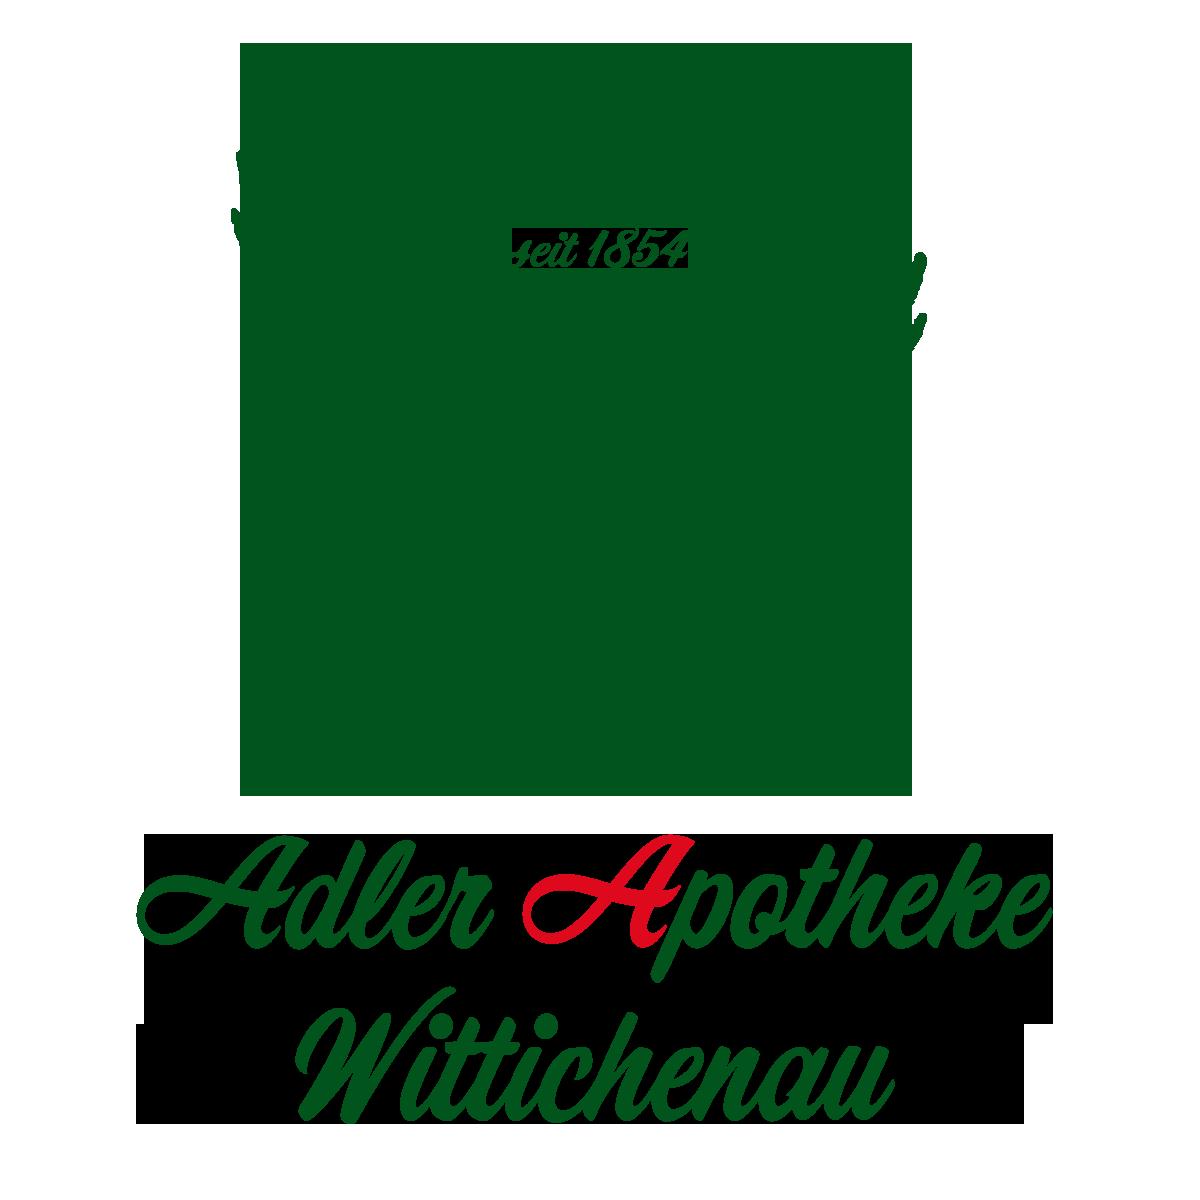 Adler Apotheke Wittichenau